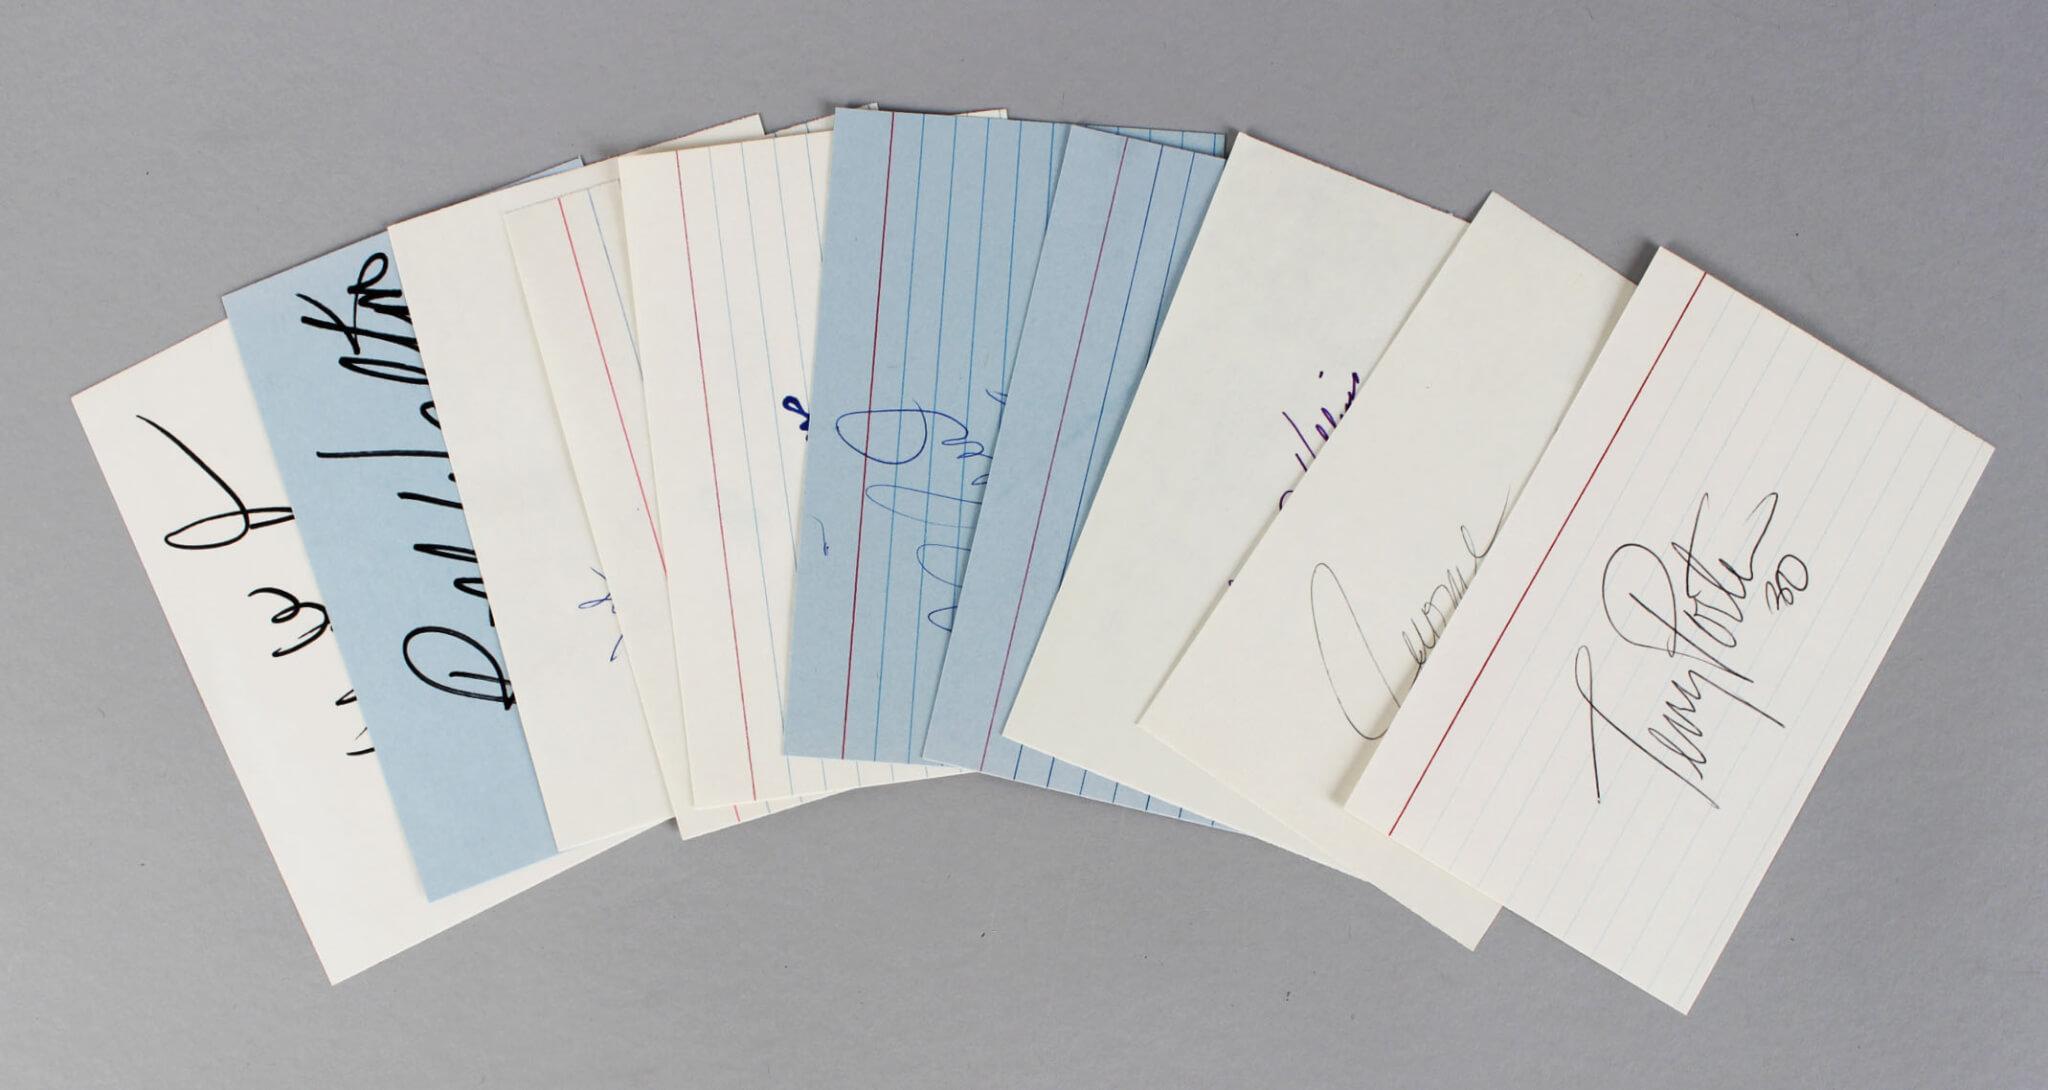 Portland Trailblazers Signed 3x5 Index Card Lot (10) - Bill Walton, Clyde Drexler, Terry Porter etc. (JSA)